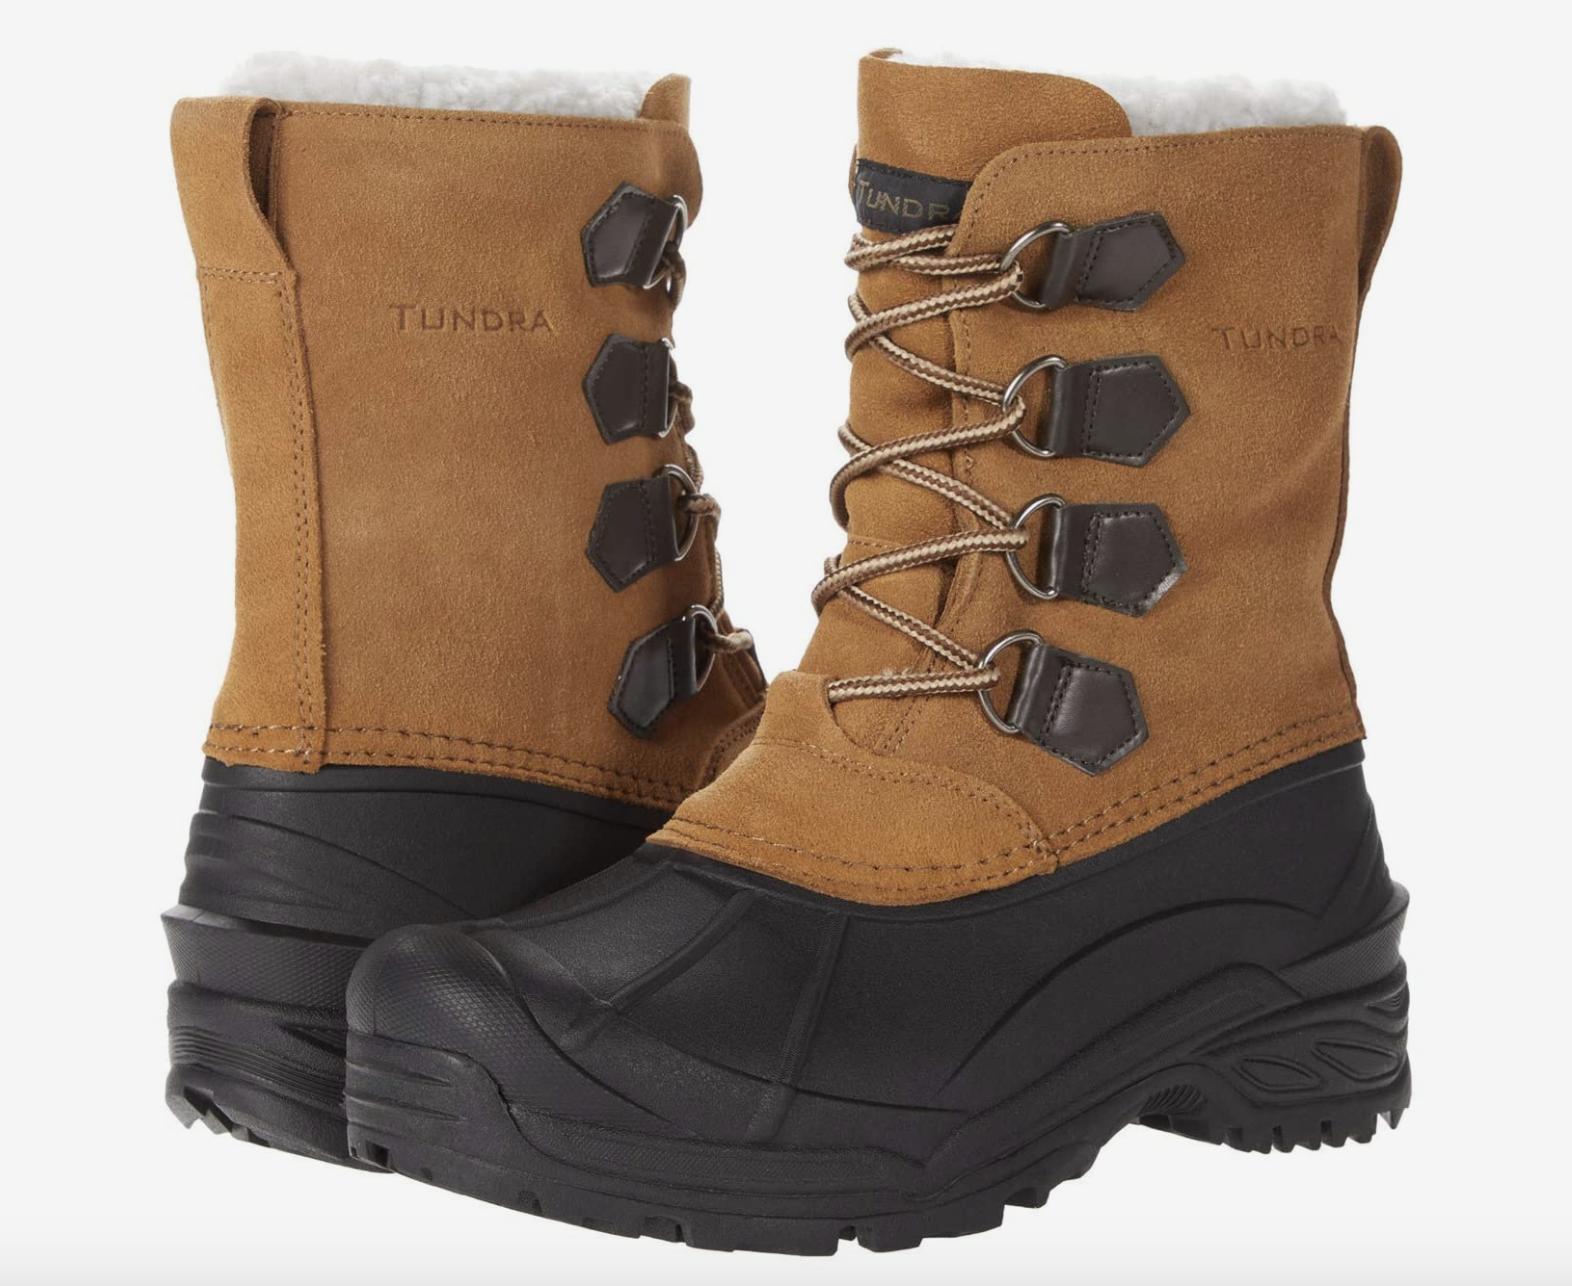 Tundra Boots Duluth